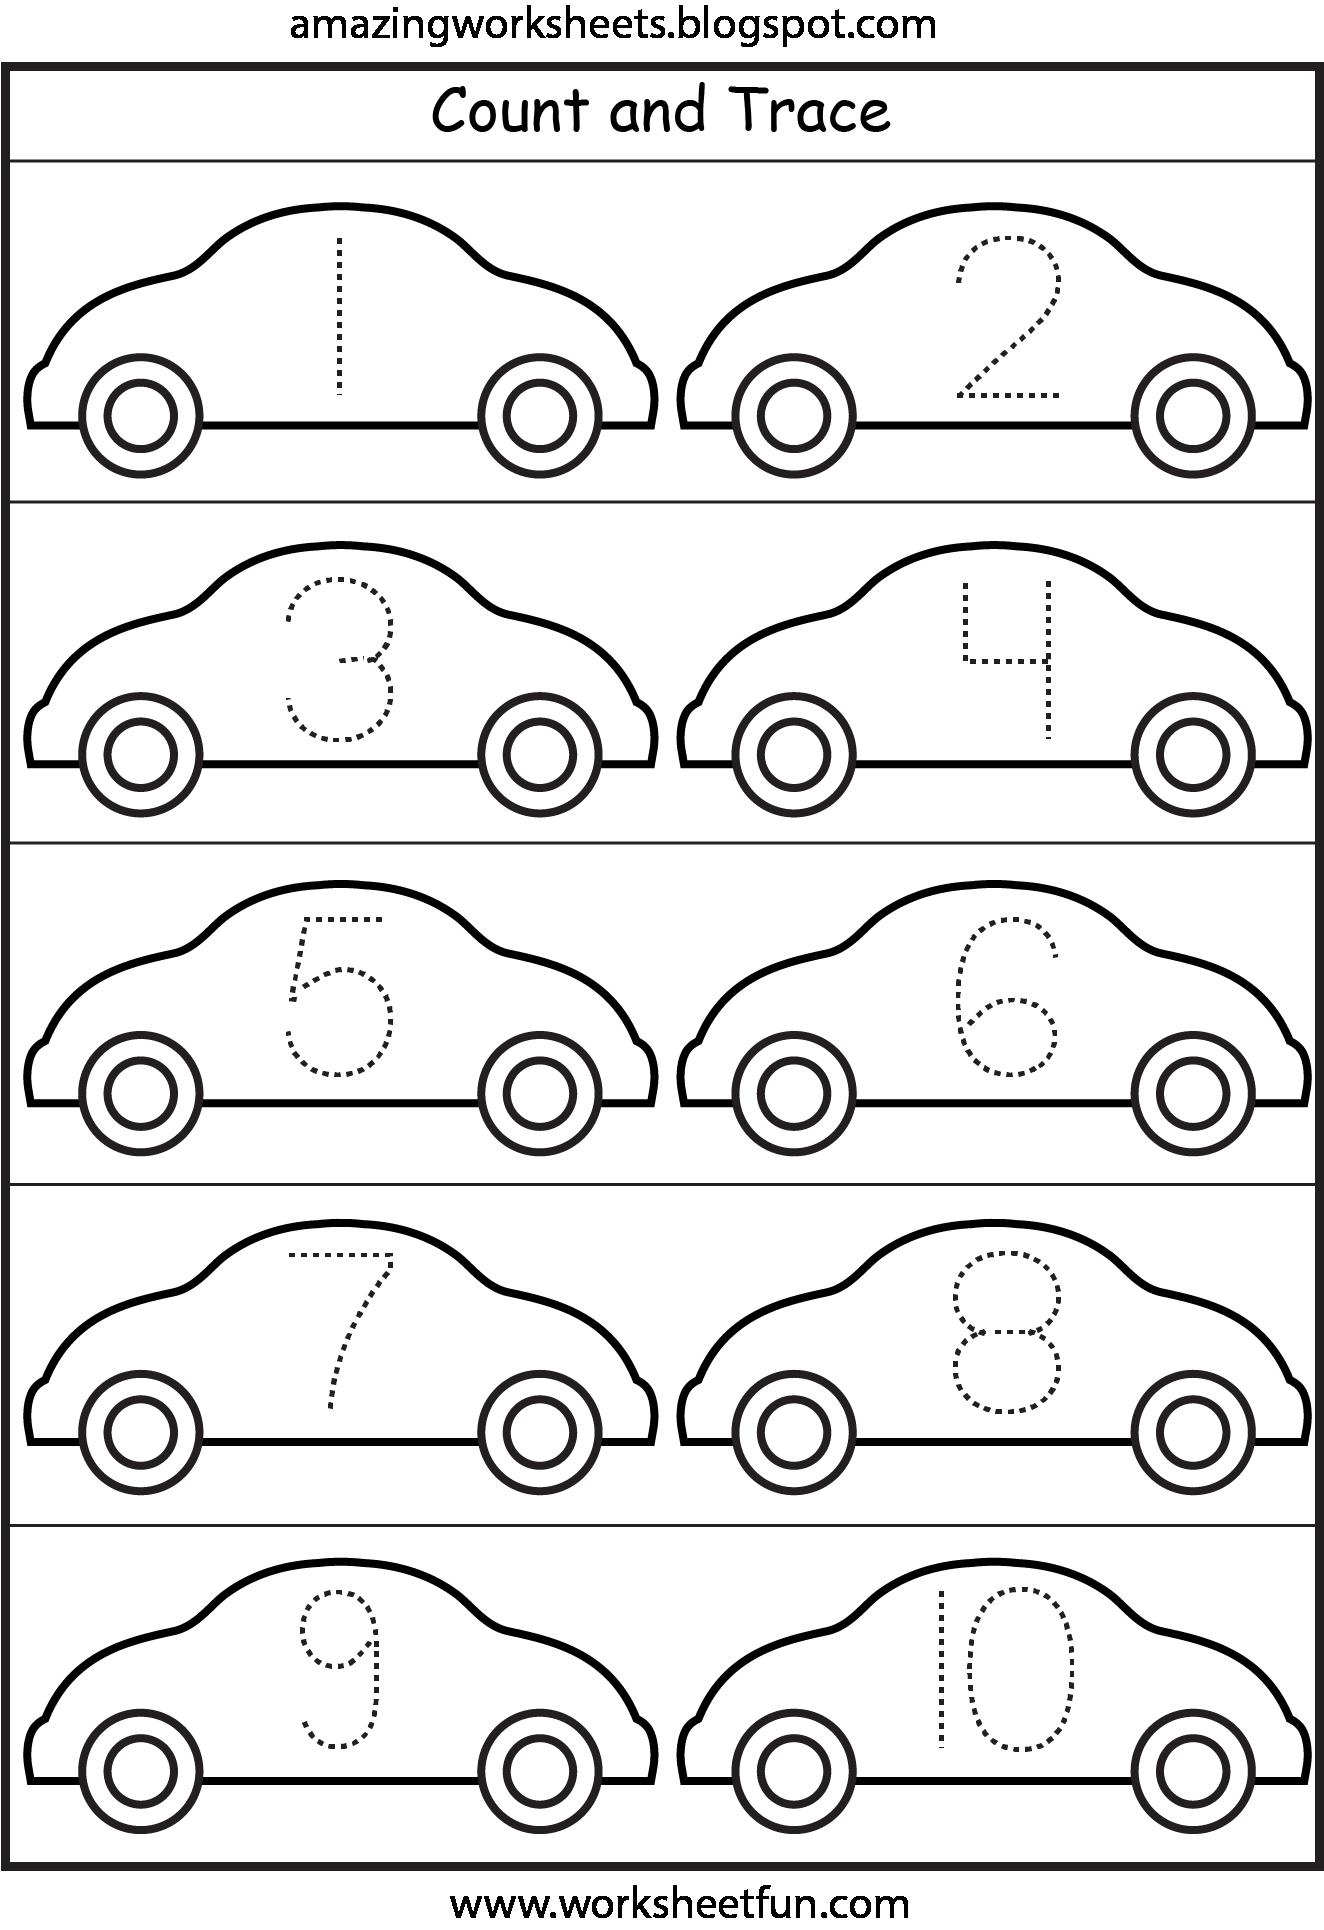 worksheet Number Tracing Worksheets 1-10 lots of worksheets for all themescars number tracing 1 10 1